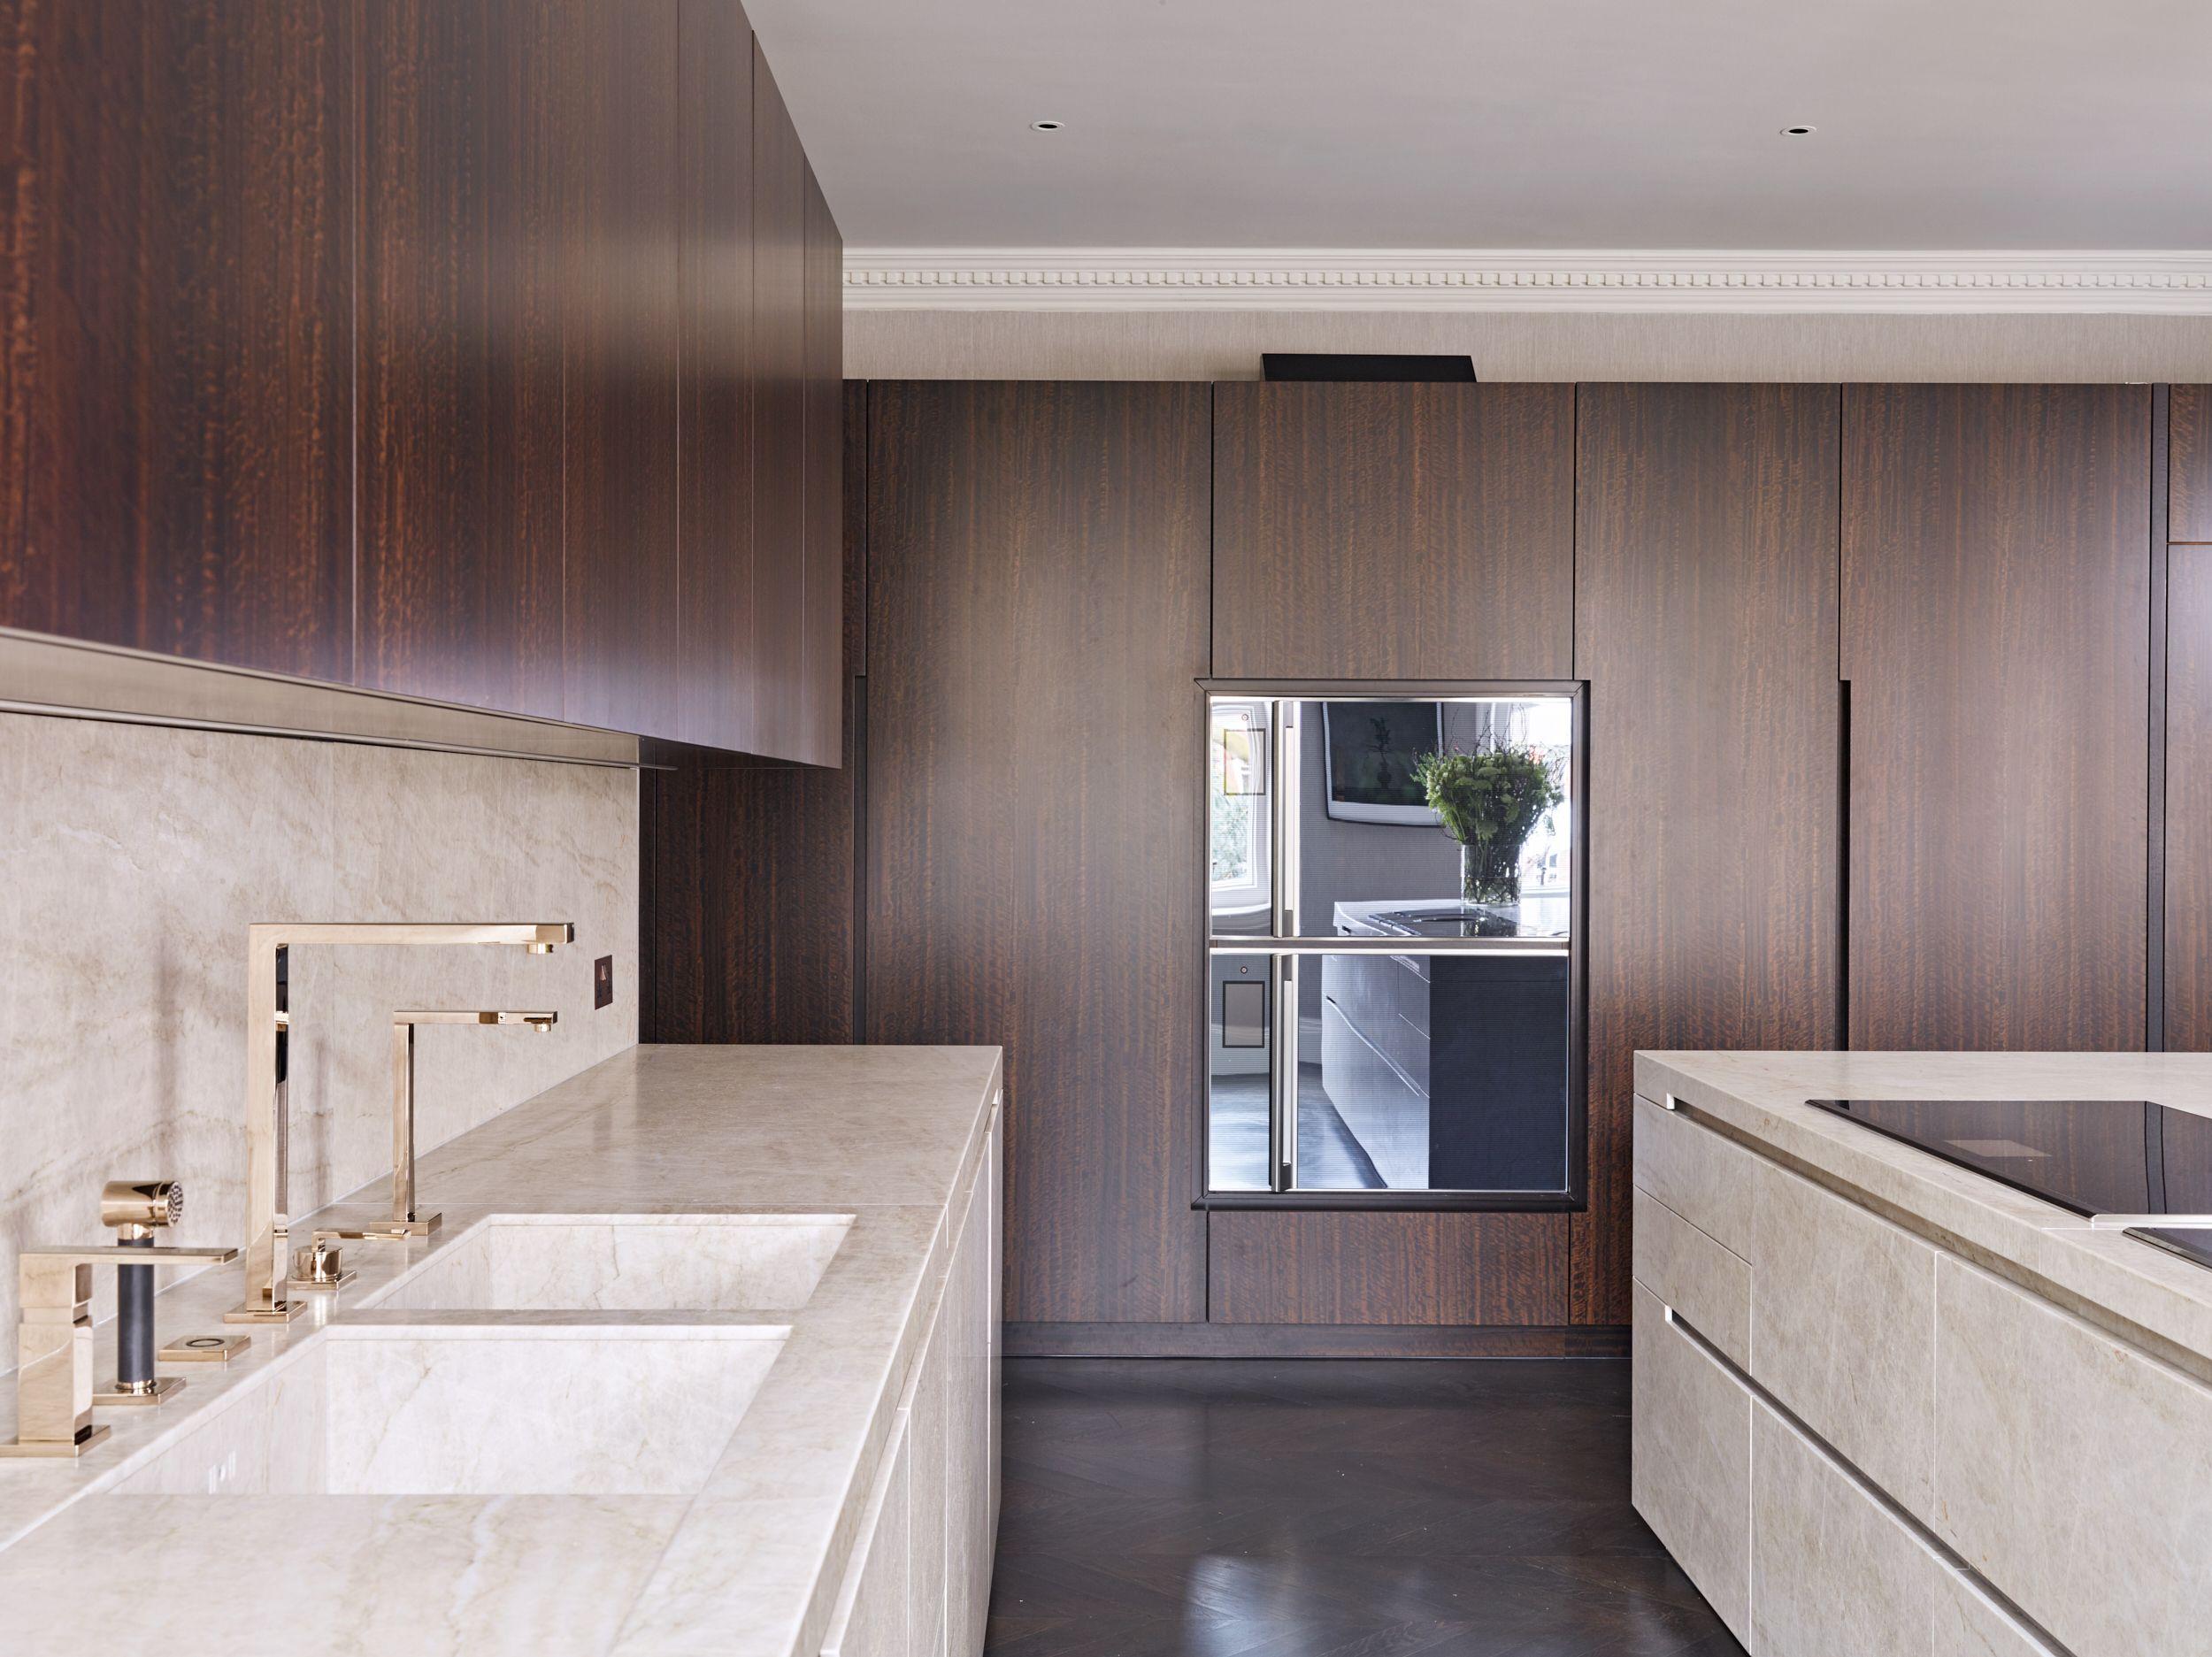 Eggersmann Design Taj Mahal Quartzite Island With Smoked Eucalyptus Veneered Cabinetry London Kitchen Contemporary Kitchen Design